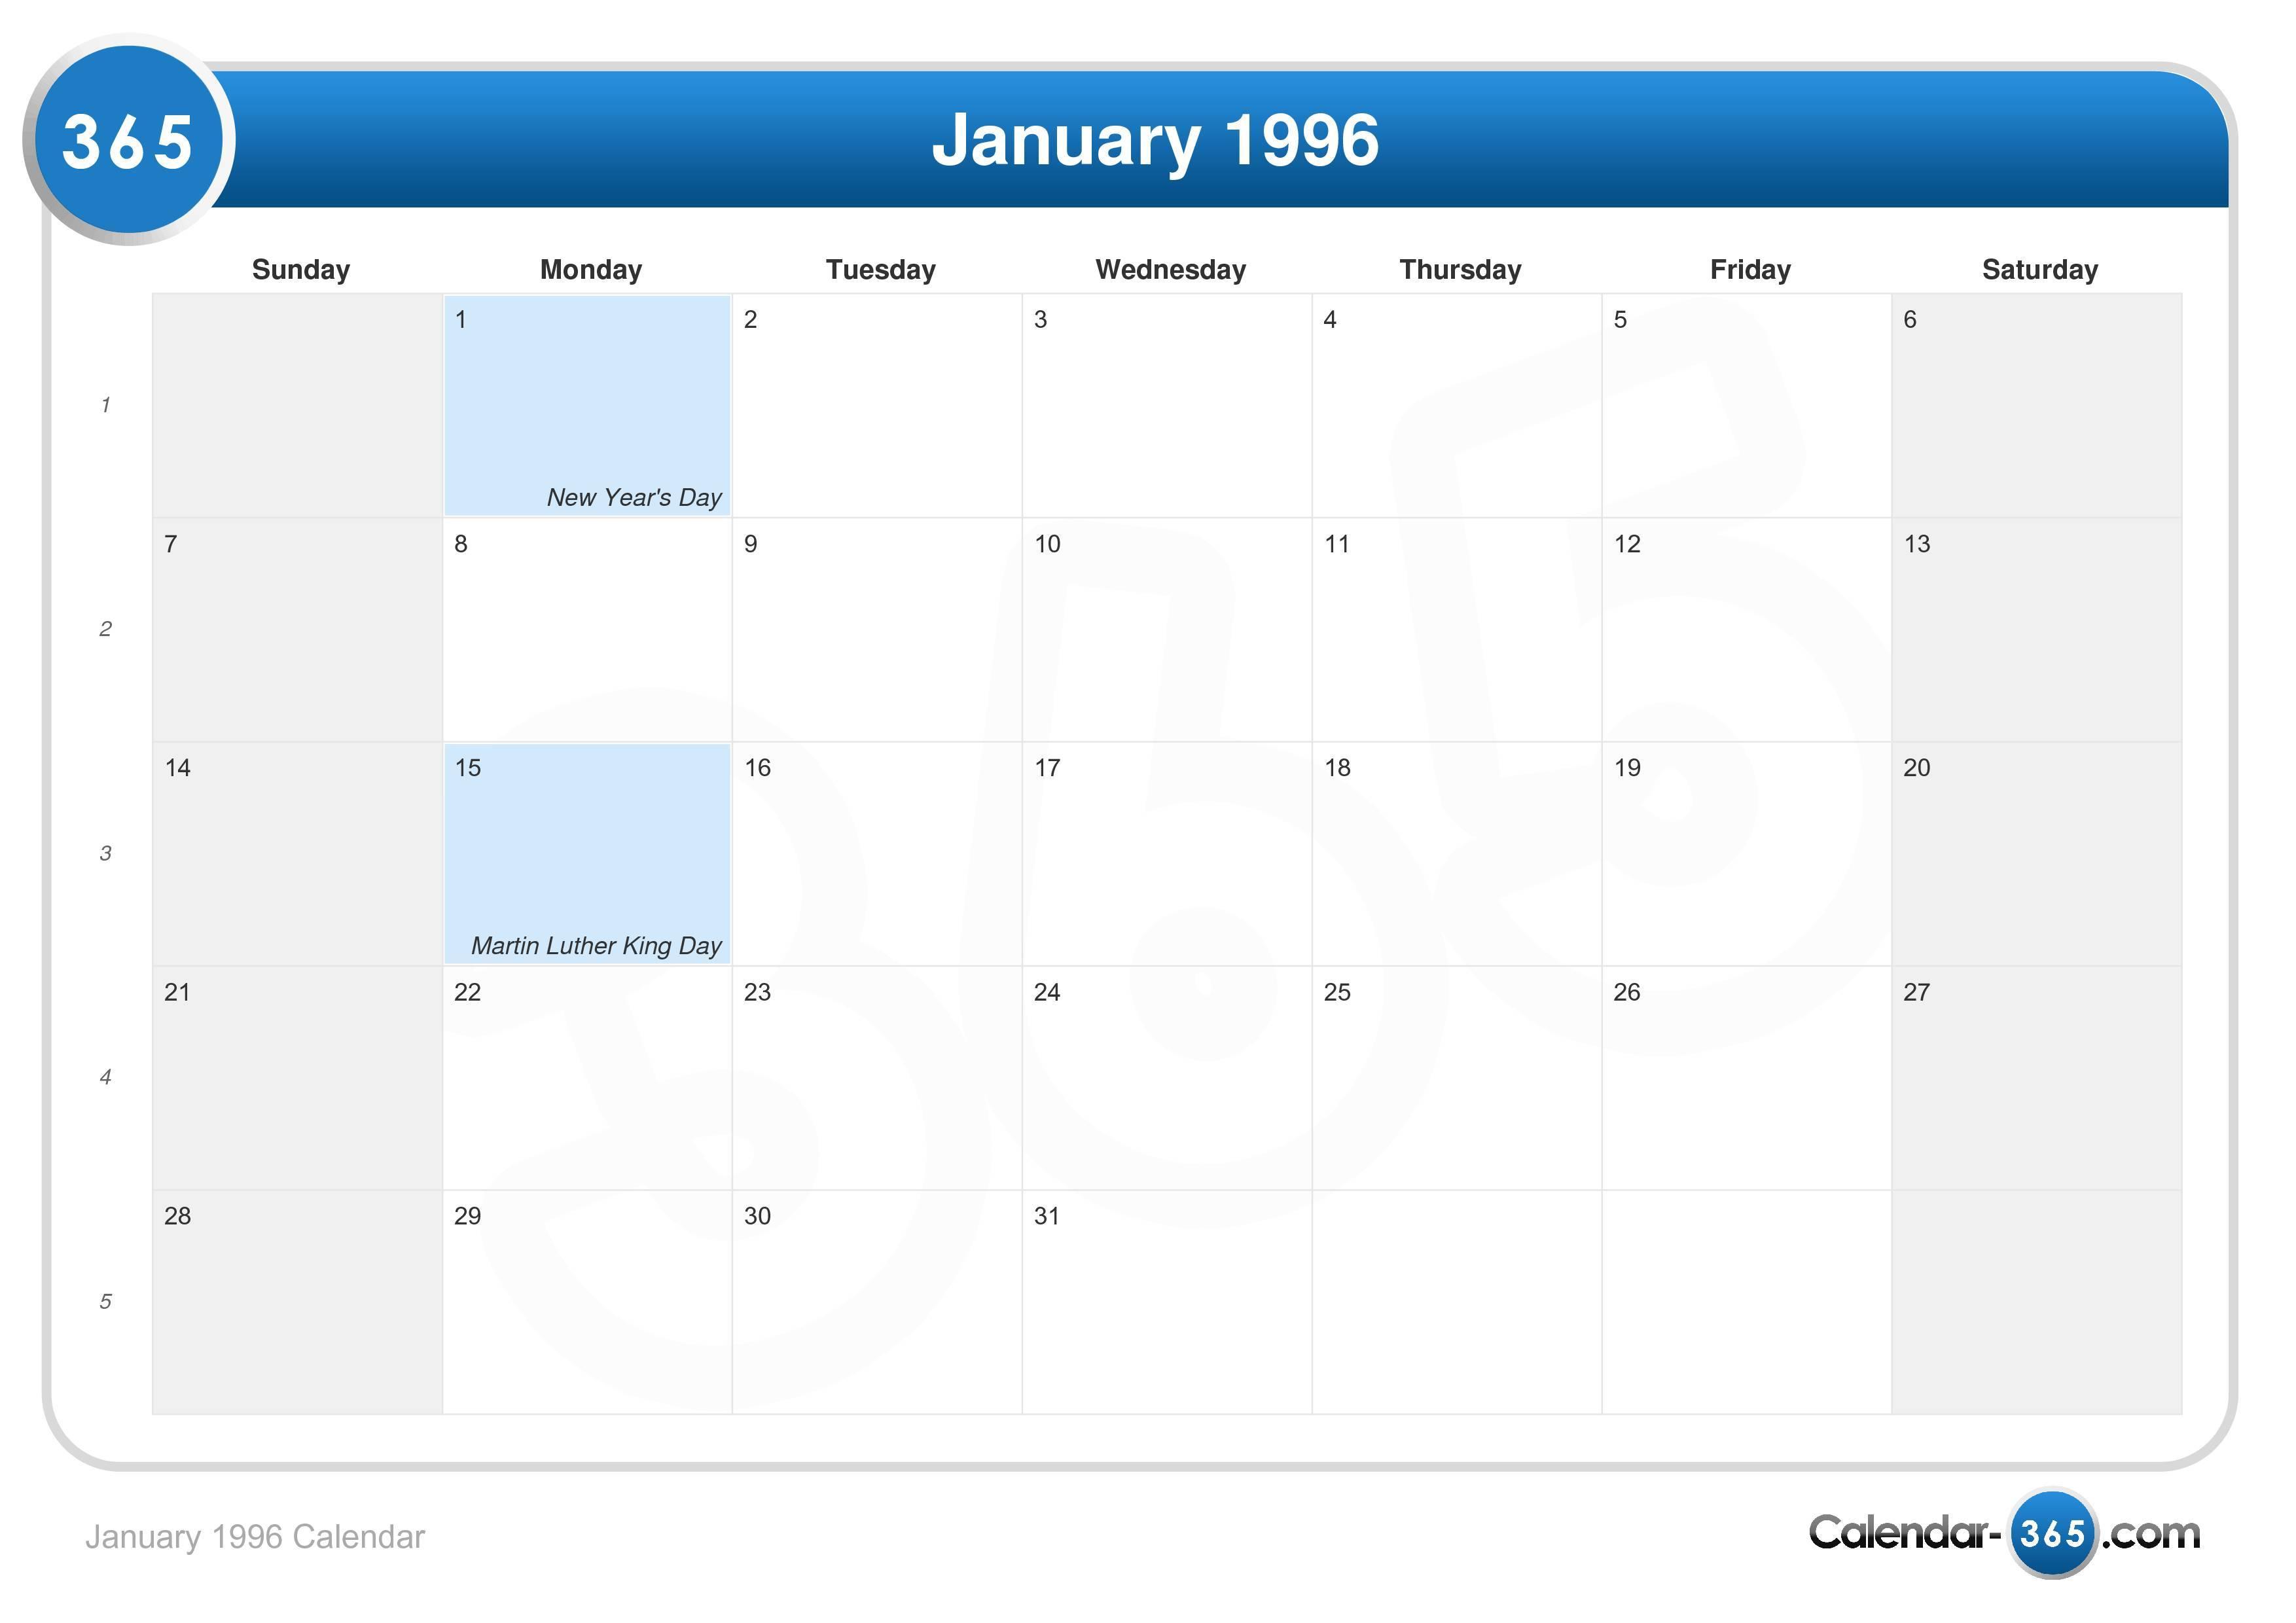 January 1996 Calendar